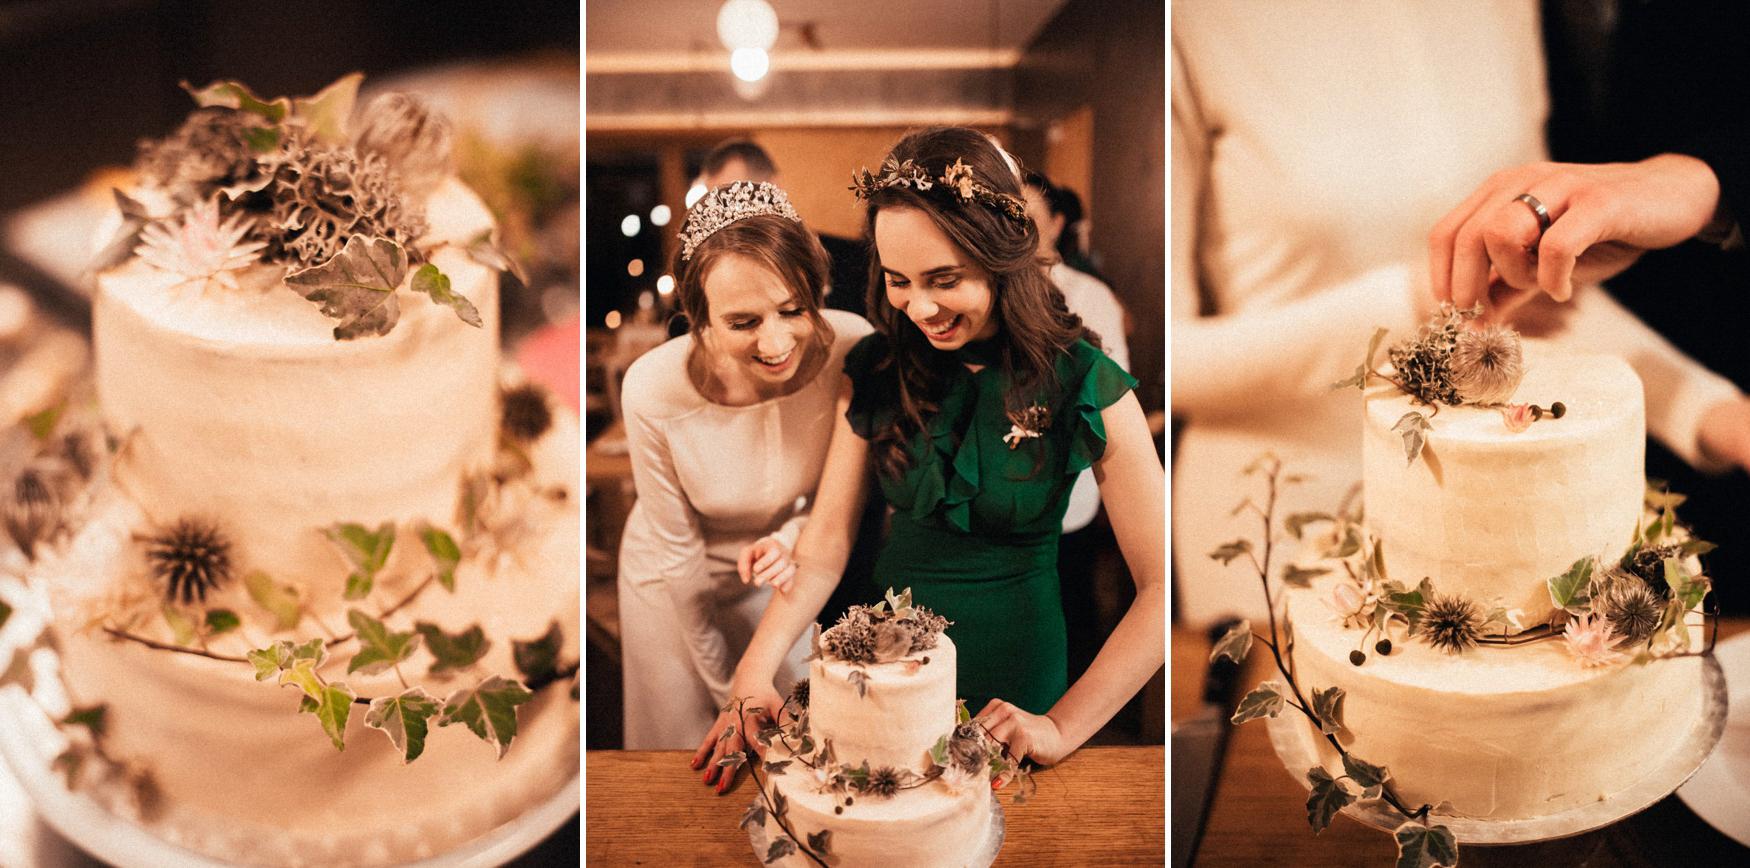 3 czech countryside rustic wedding - svatba zikmundov021.jpg